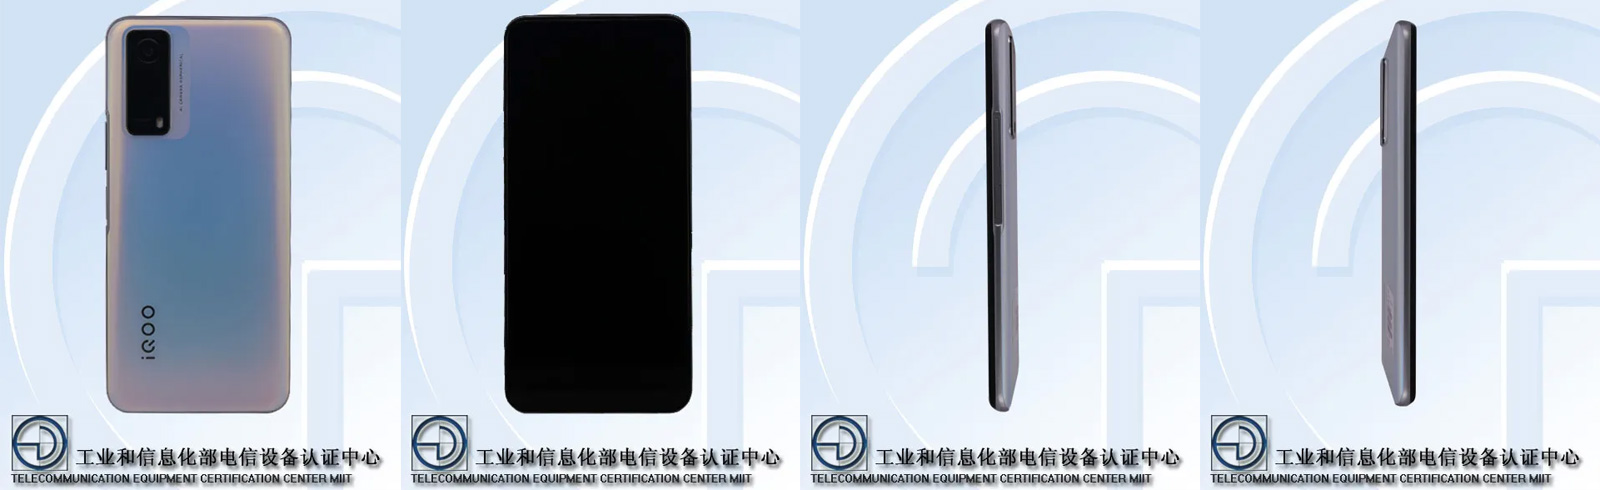 The iQOO Z5x (iQOO V2131A) is certified by TENAA